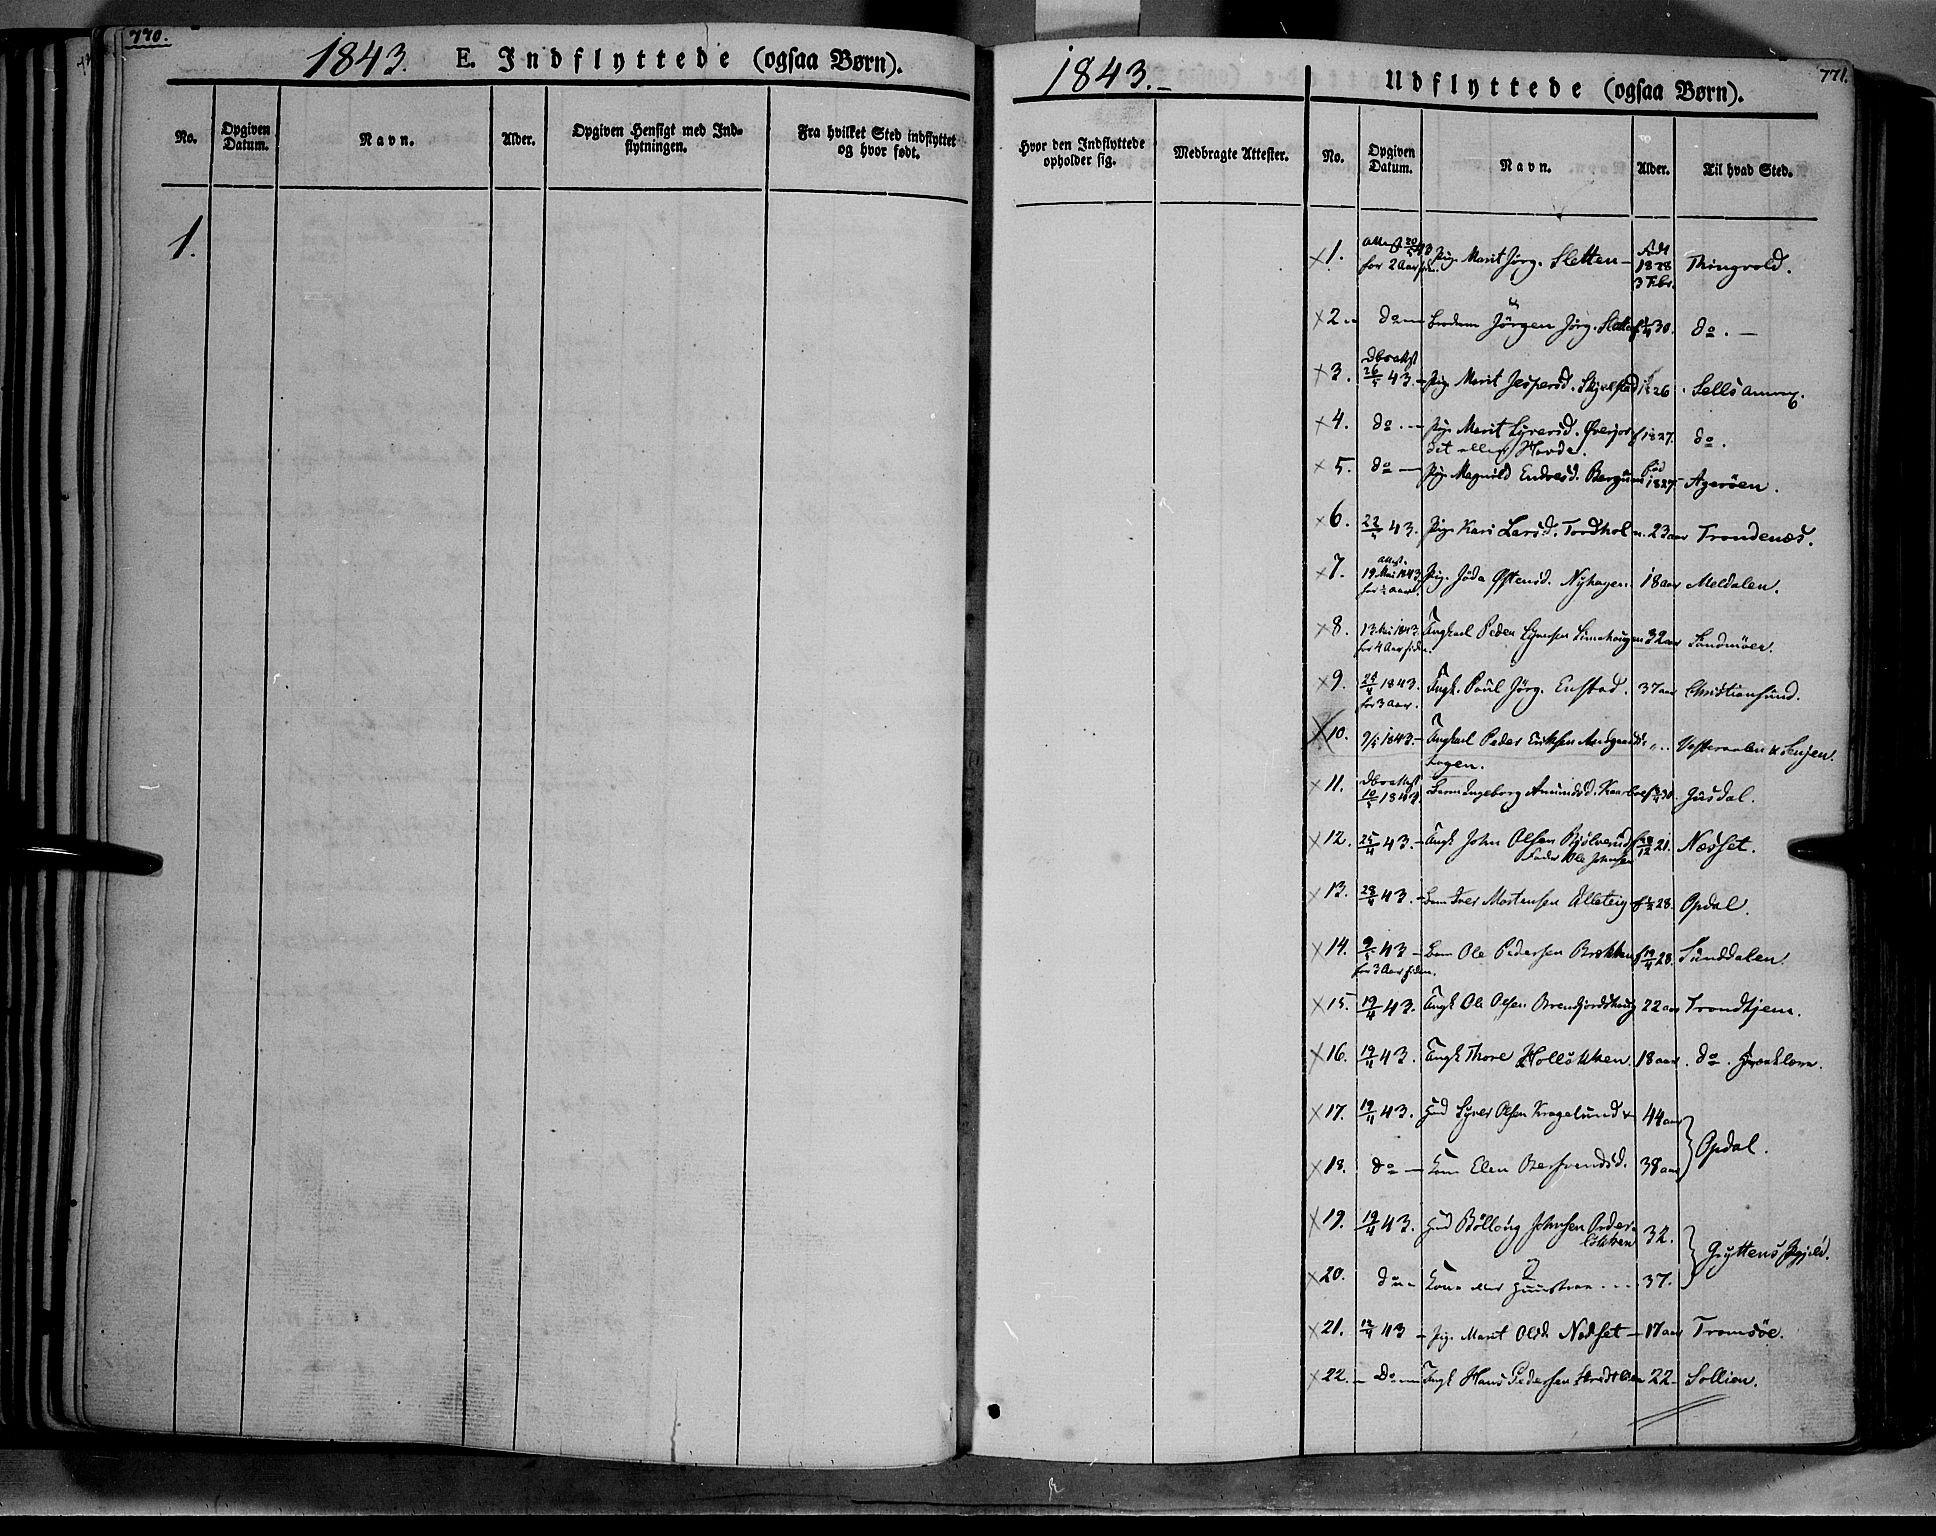 SAH, Lesja prestekontor, Ministerialbok nr. 6B, 1843-1854, s. 770-771